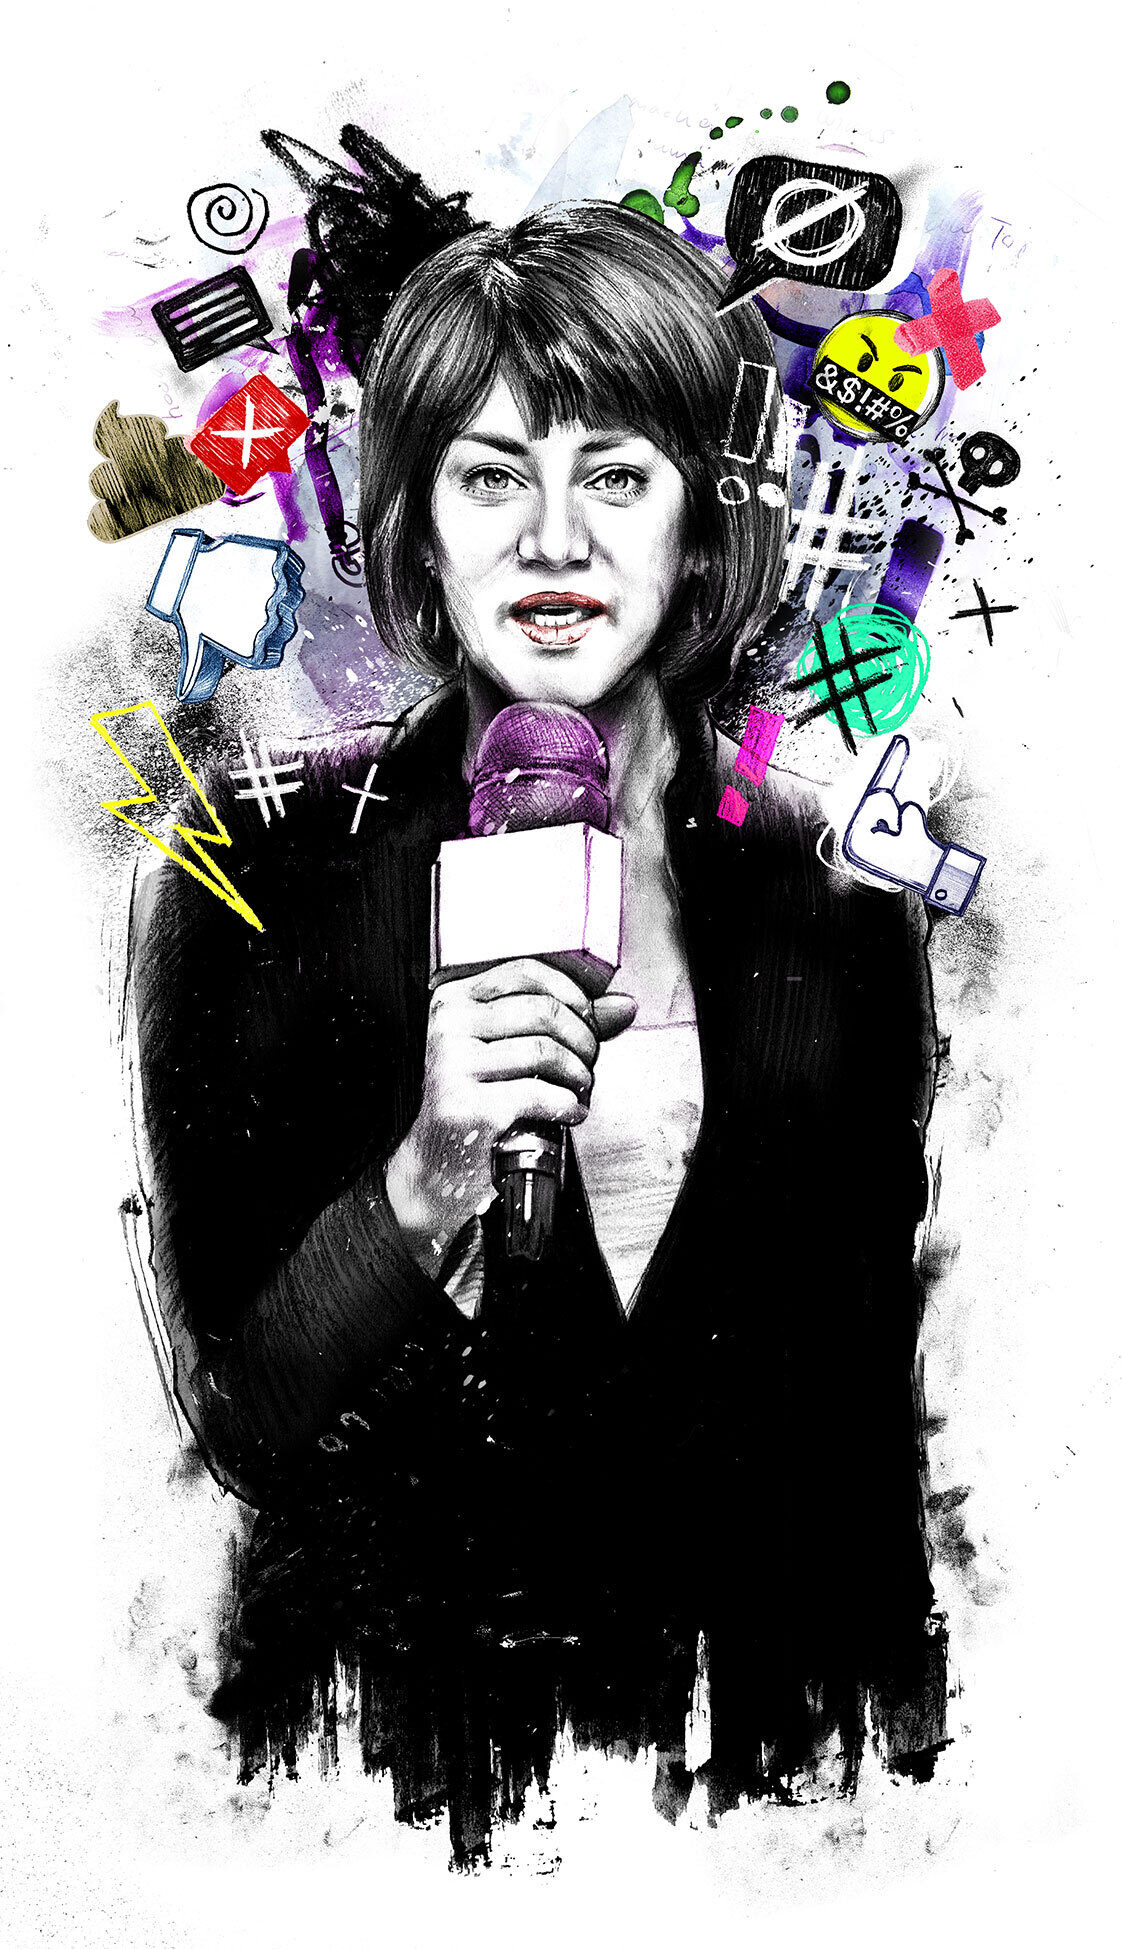 No hate woman - Kornel Illustration | Kornel Stadler portfolio